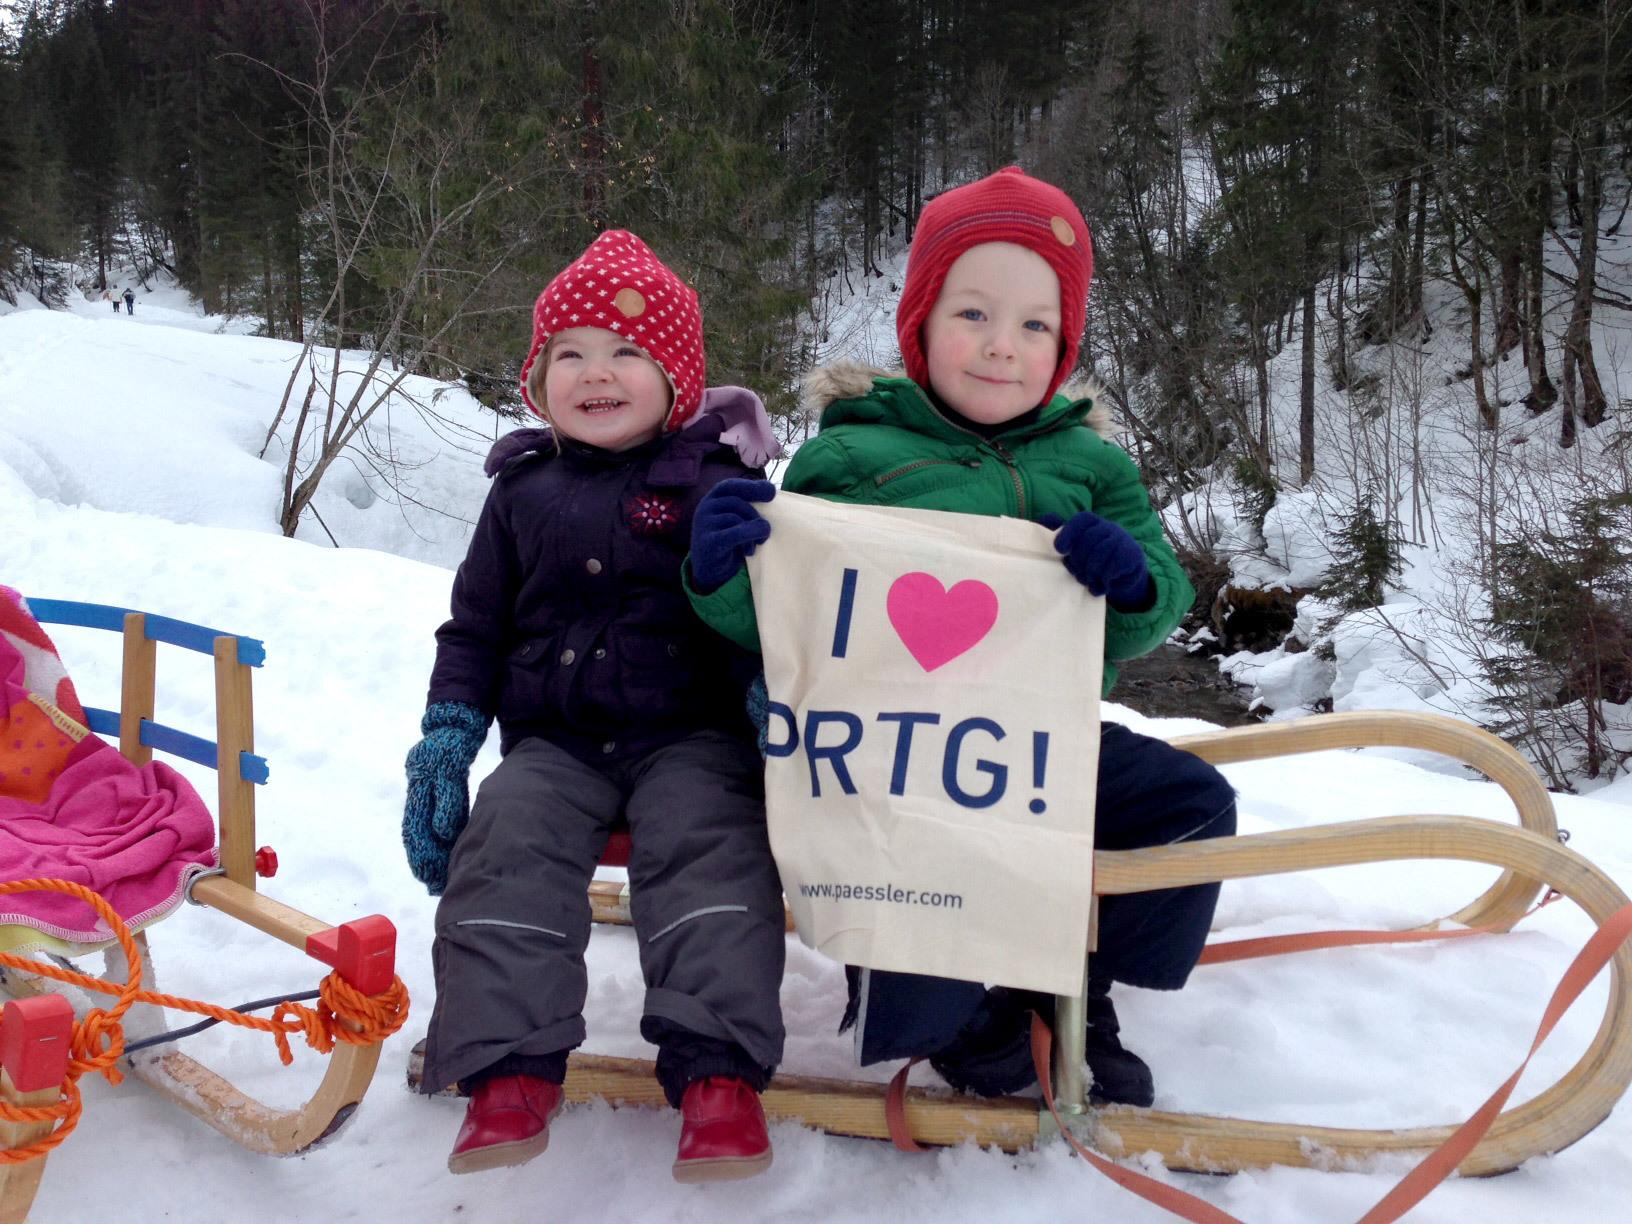 PRTG at Kleinwalsertal, Austria